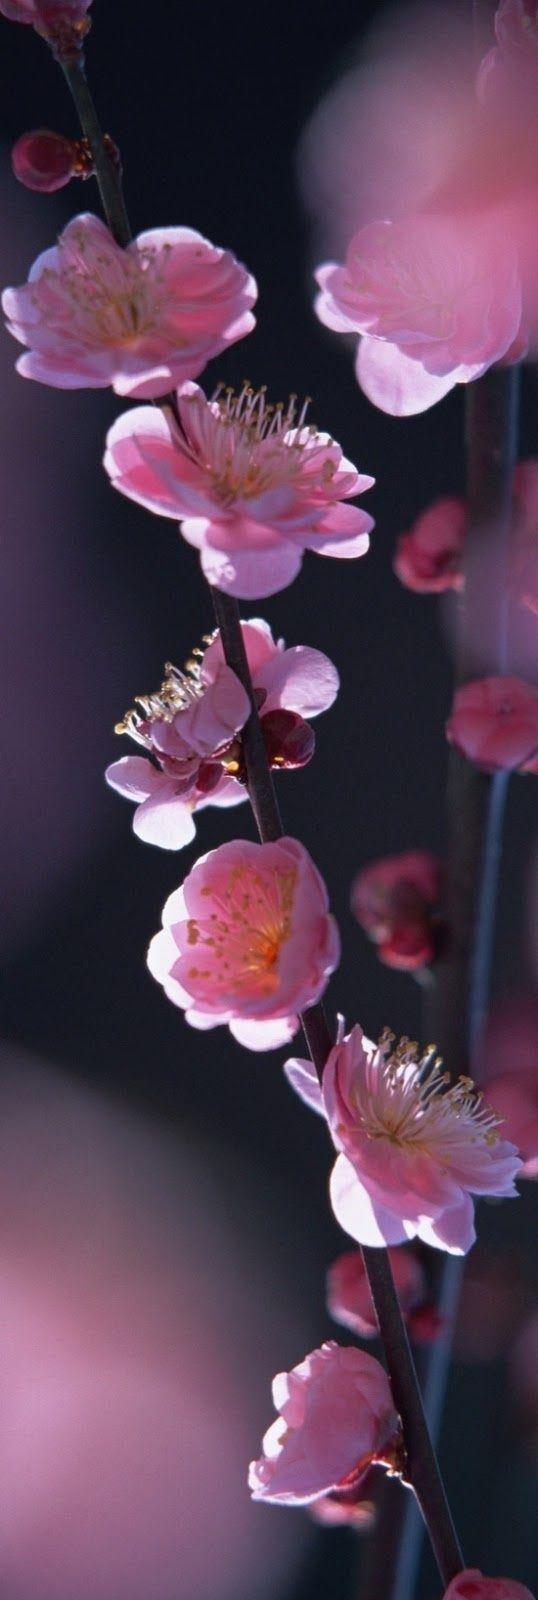 54 besten blossoms bilder auf pinterest kirschbl ten. Black Bedroom Furniture Sets. Home Design Ideas